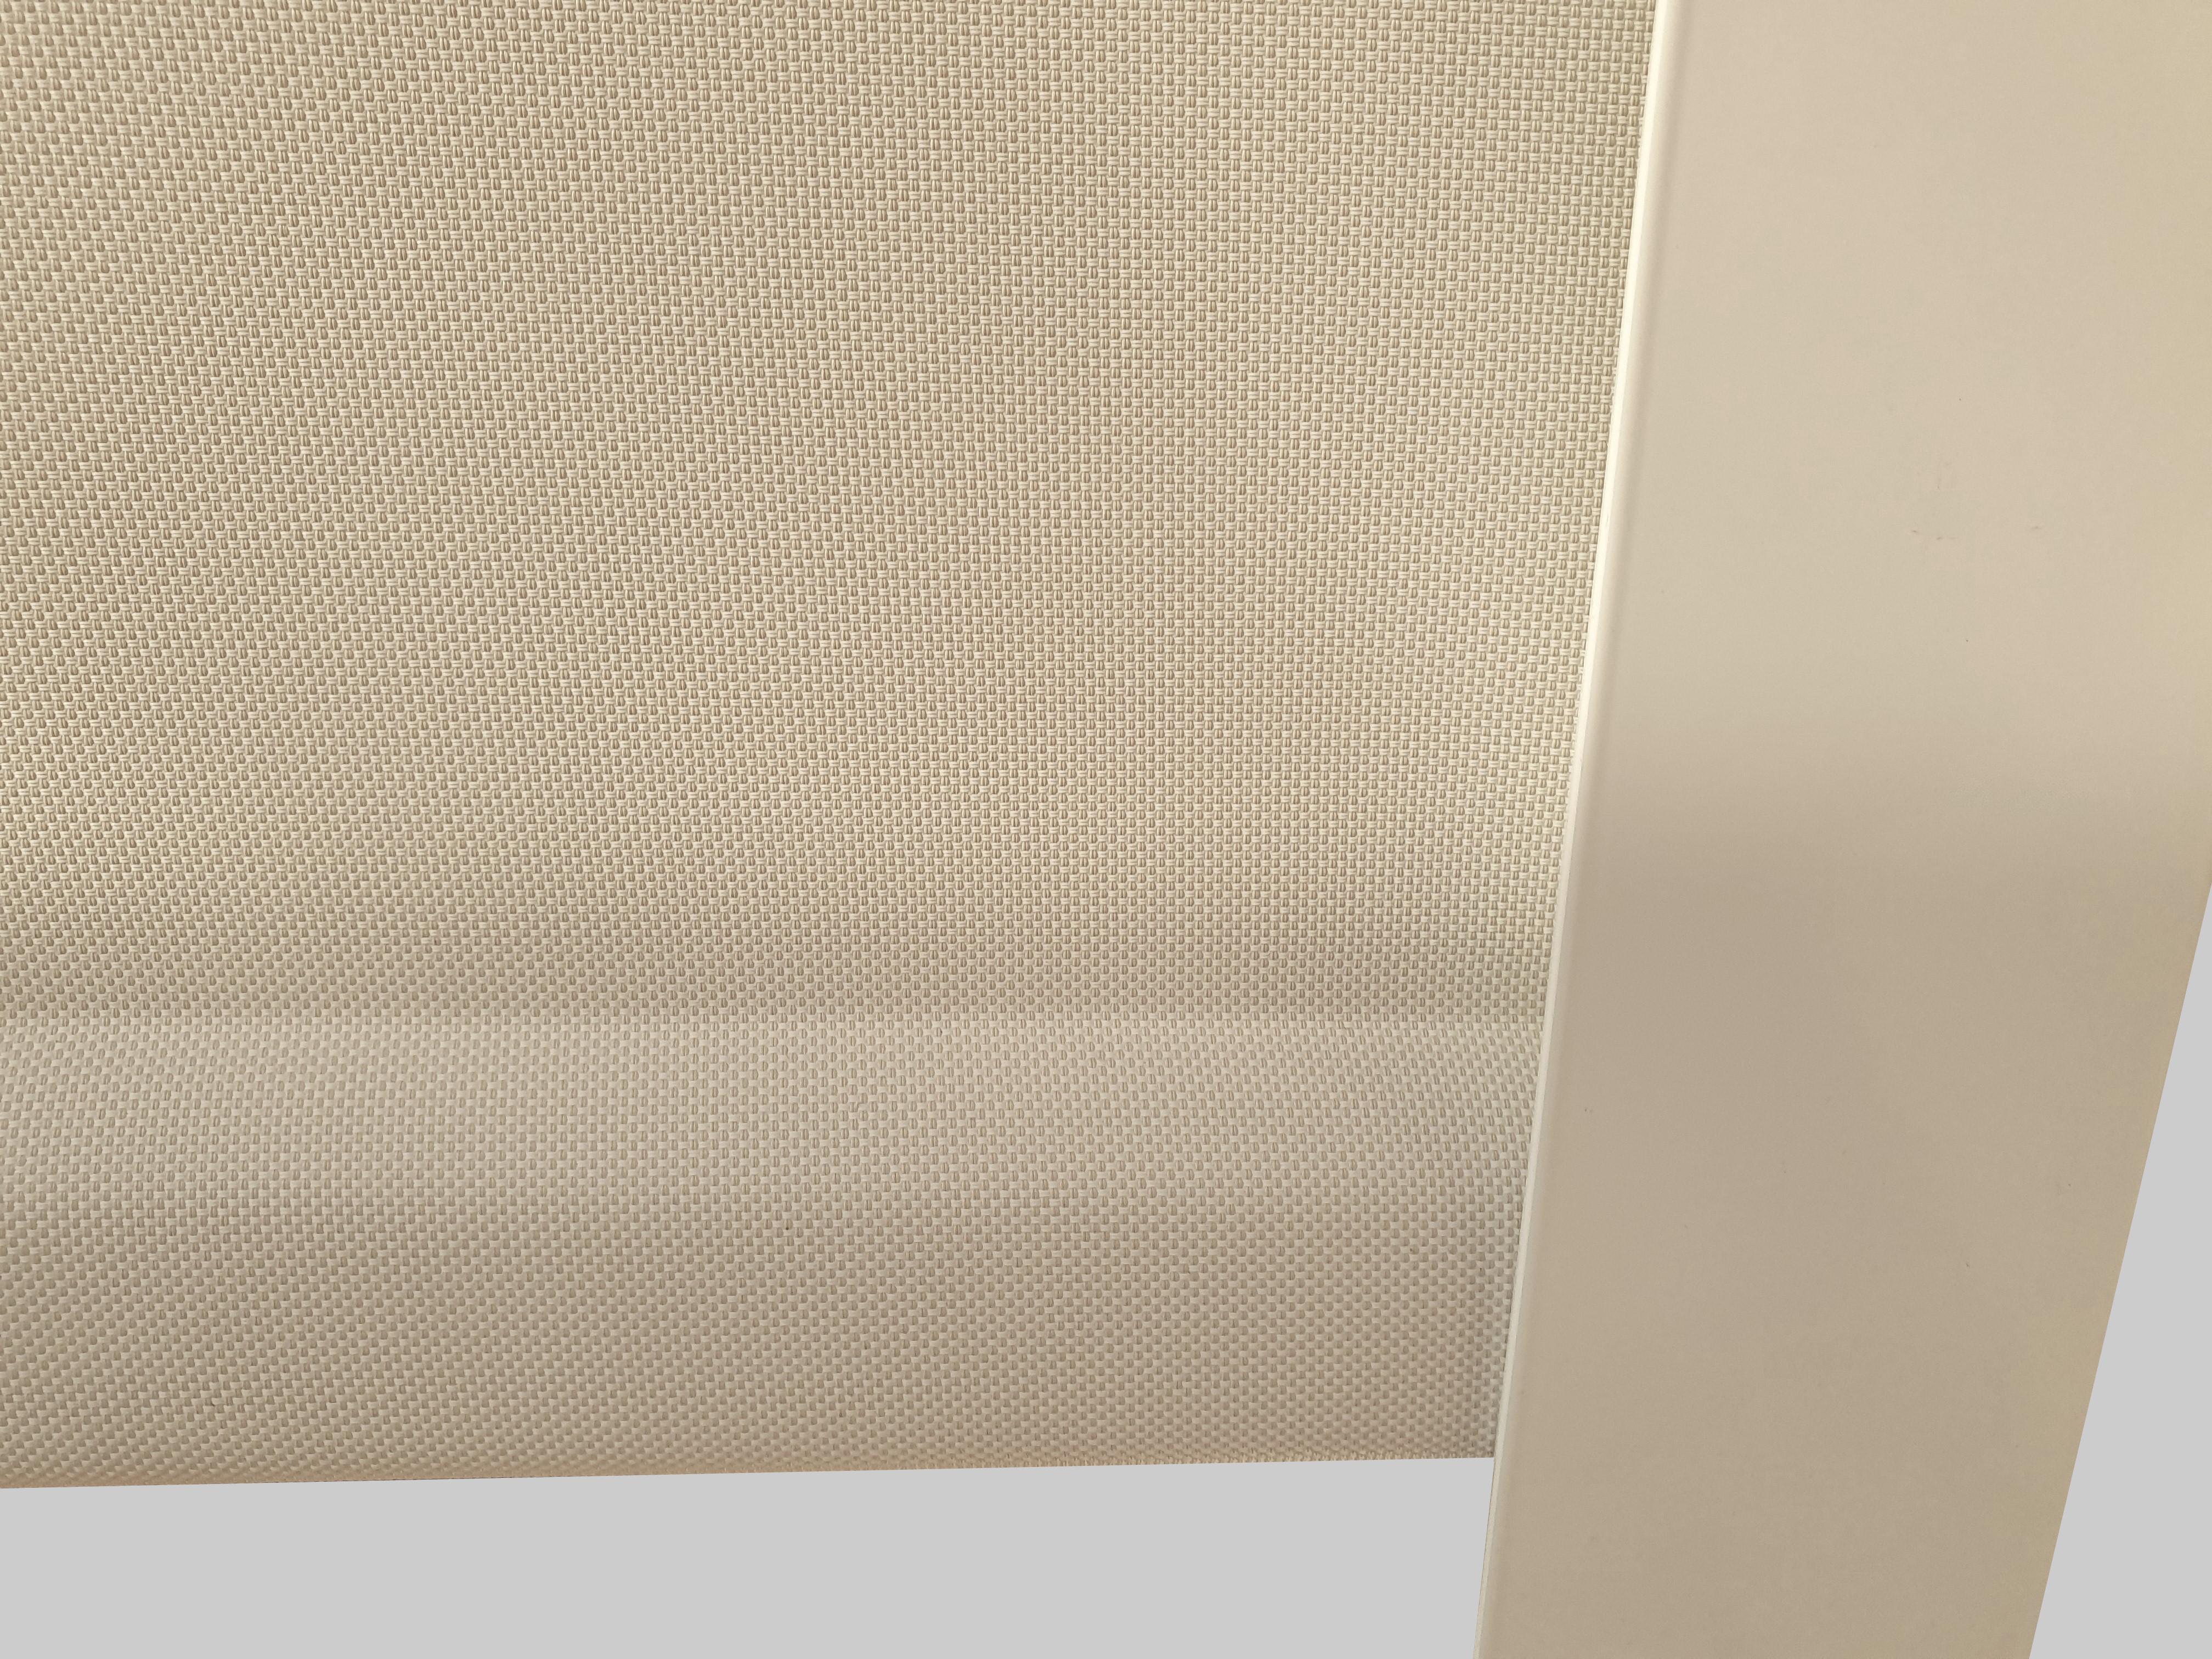 birds eye view fabric wrapped hem bar on kurolok rl system with angle